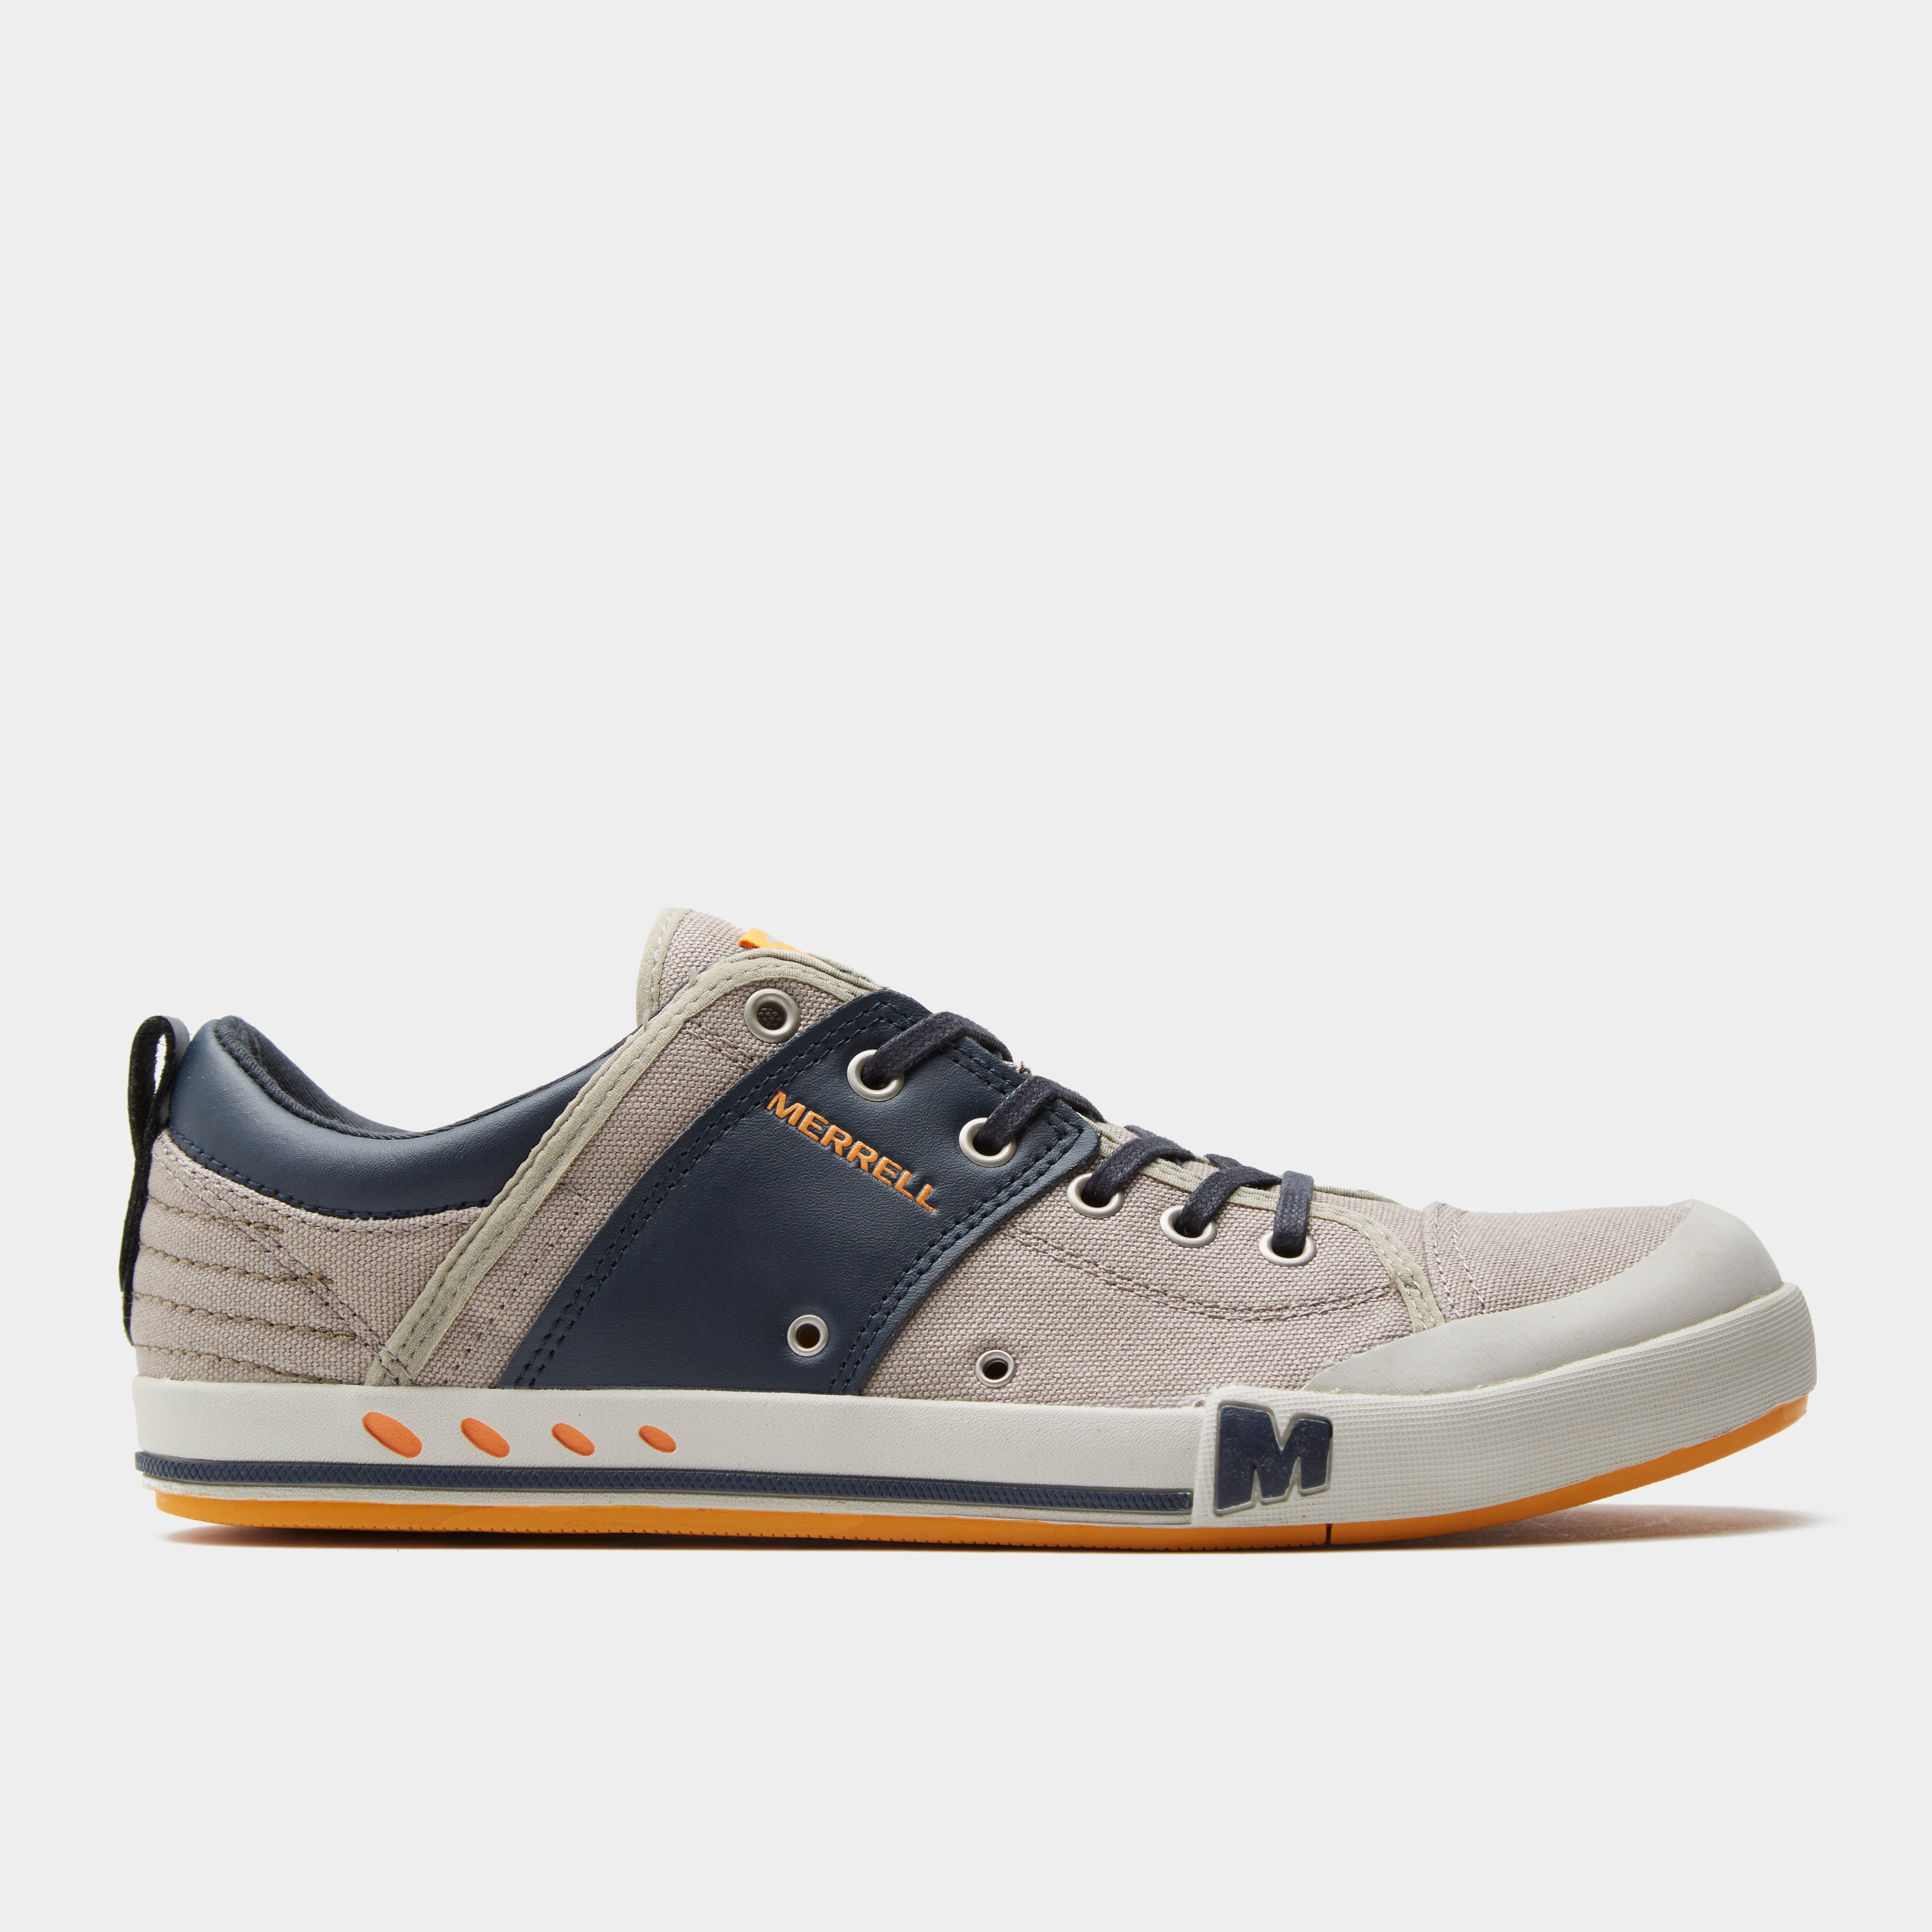 MERRELL Men's Rant Casual Shoe